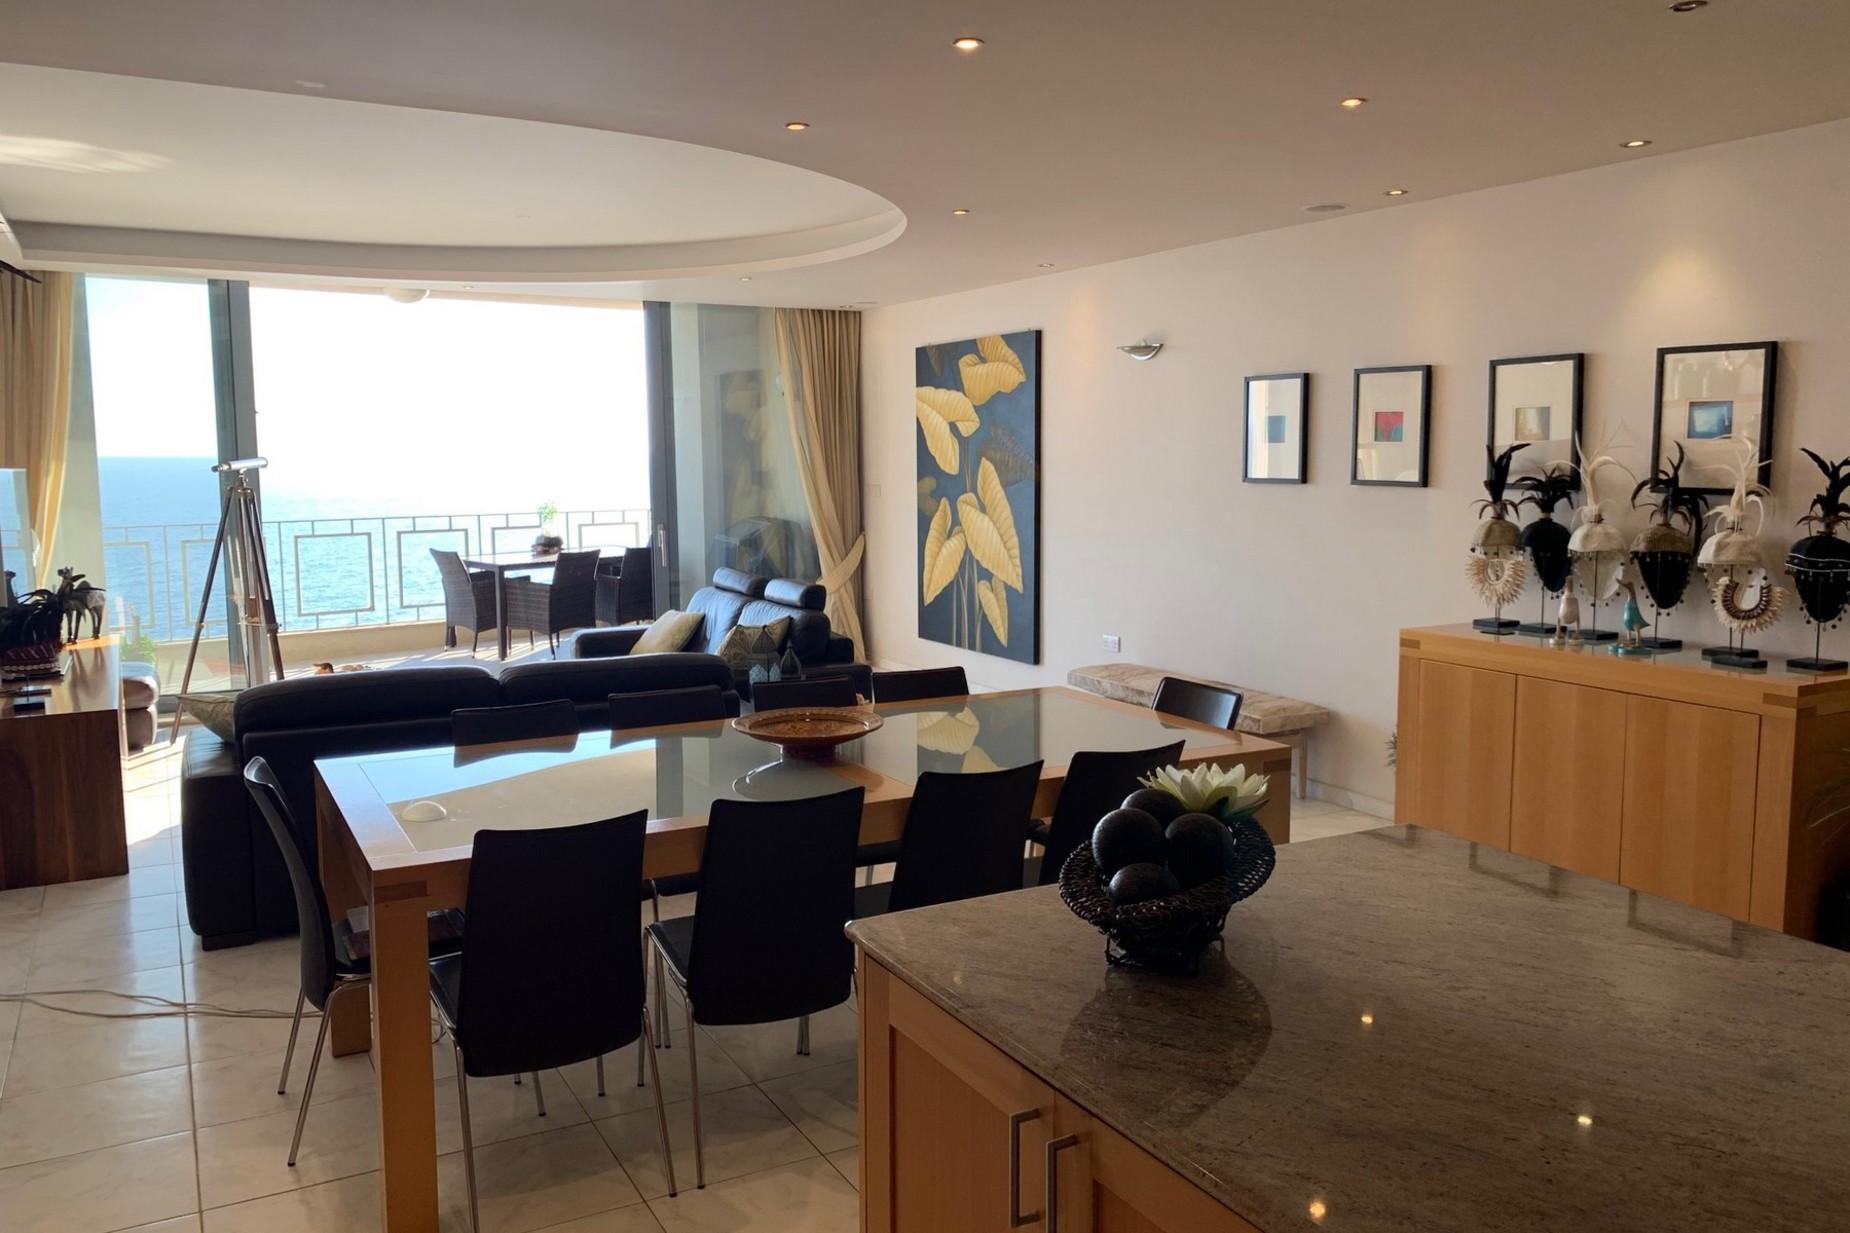 3 bed Apartment For Rent in Sliema, Sliema - thumb 14